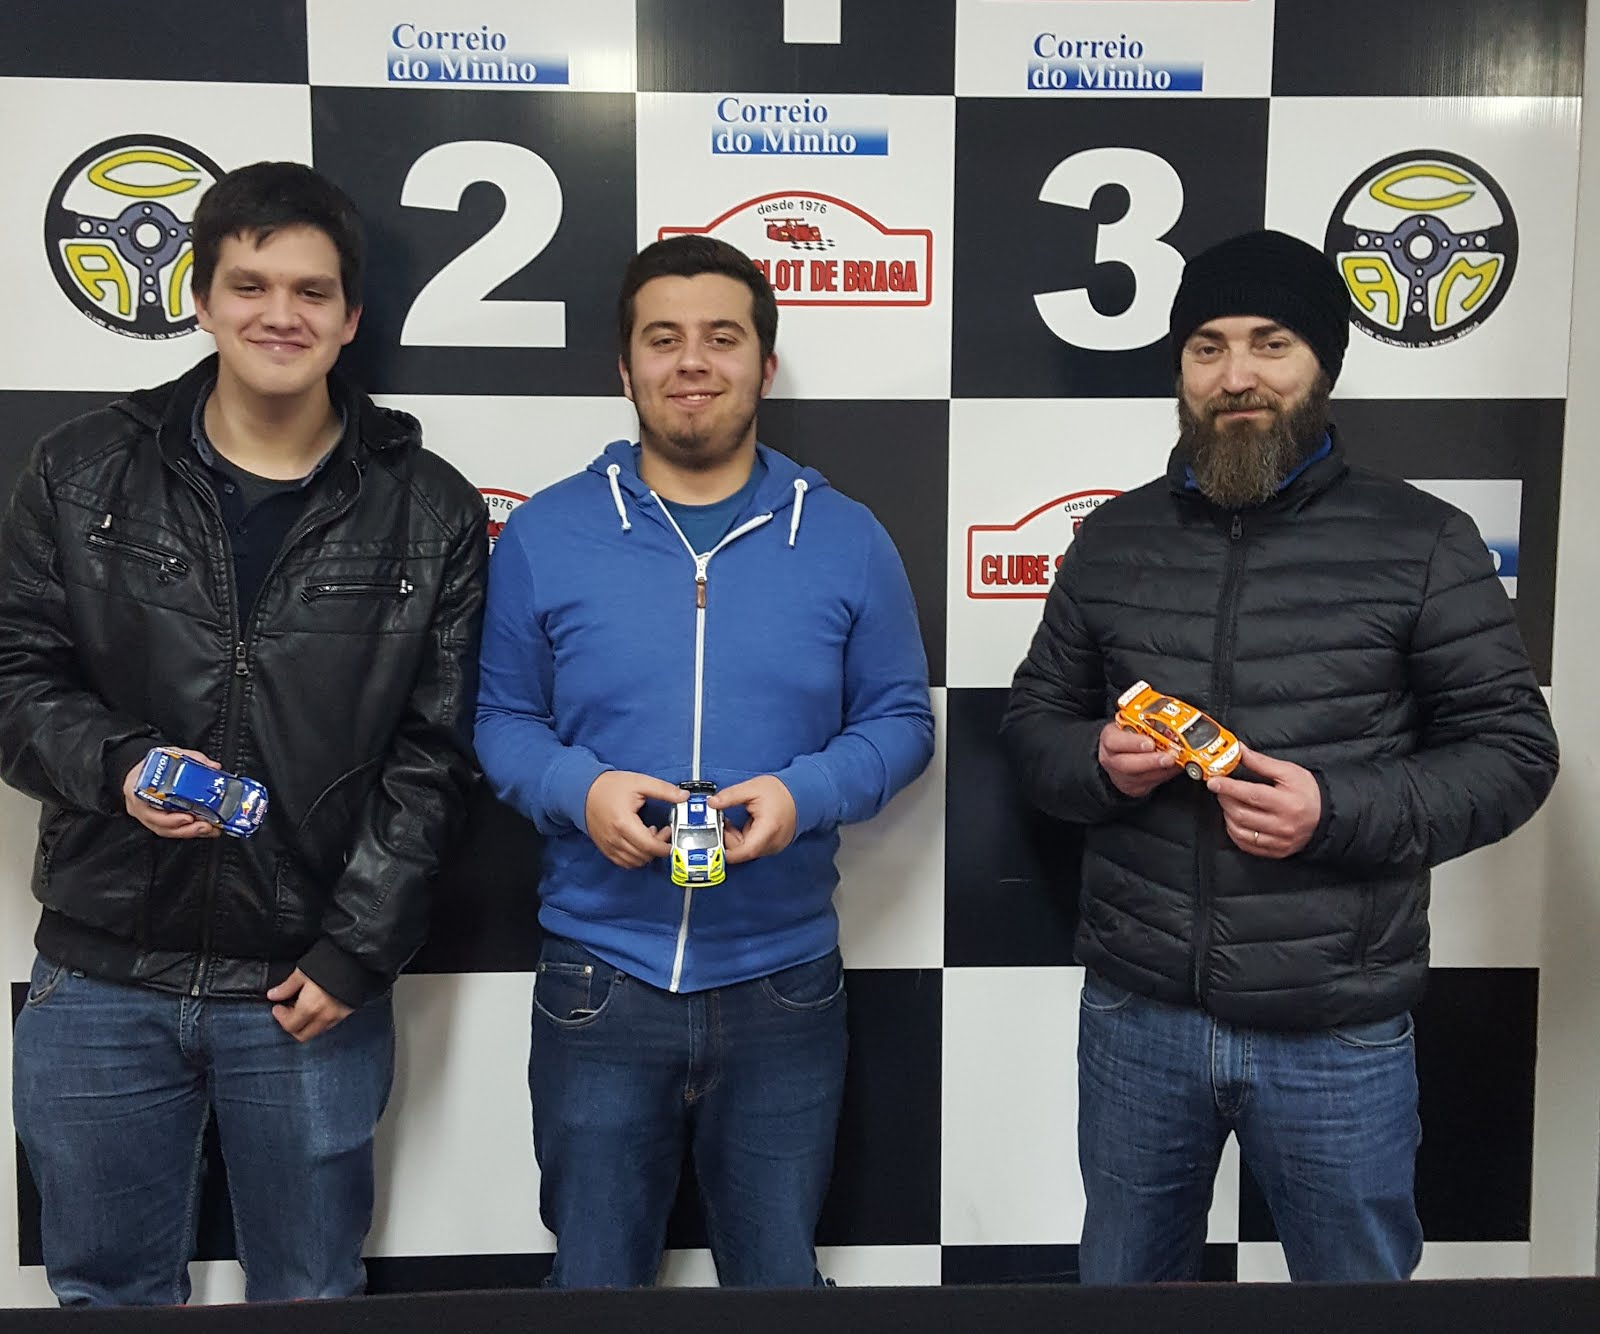 Troféu Andros 2018 - Grupo 4x4